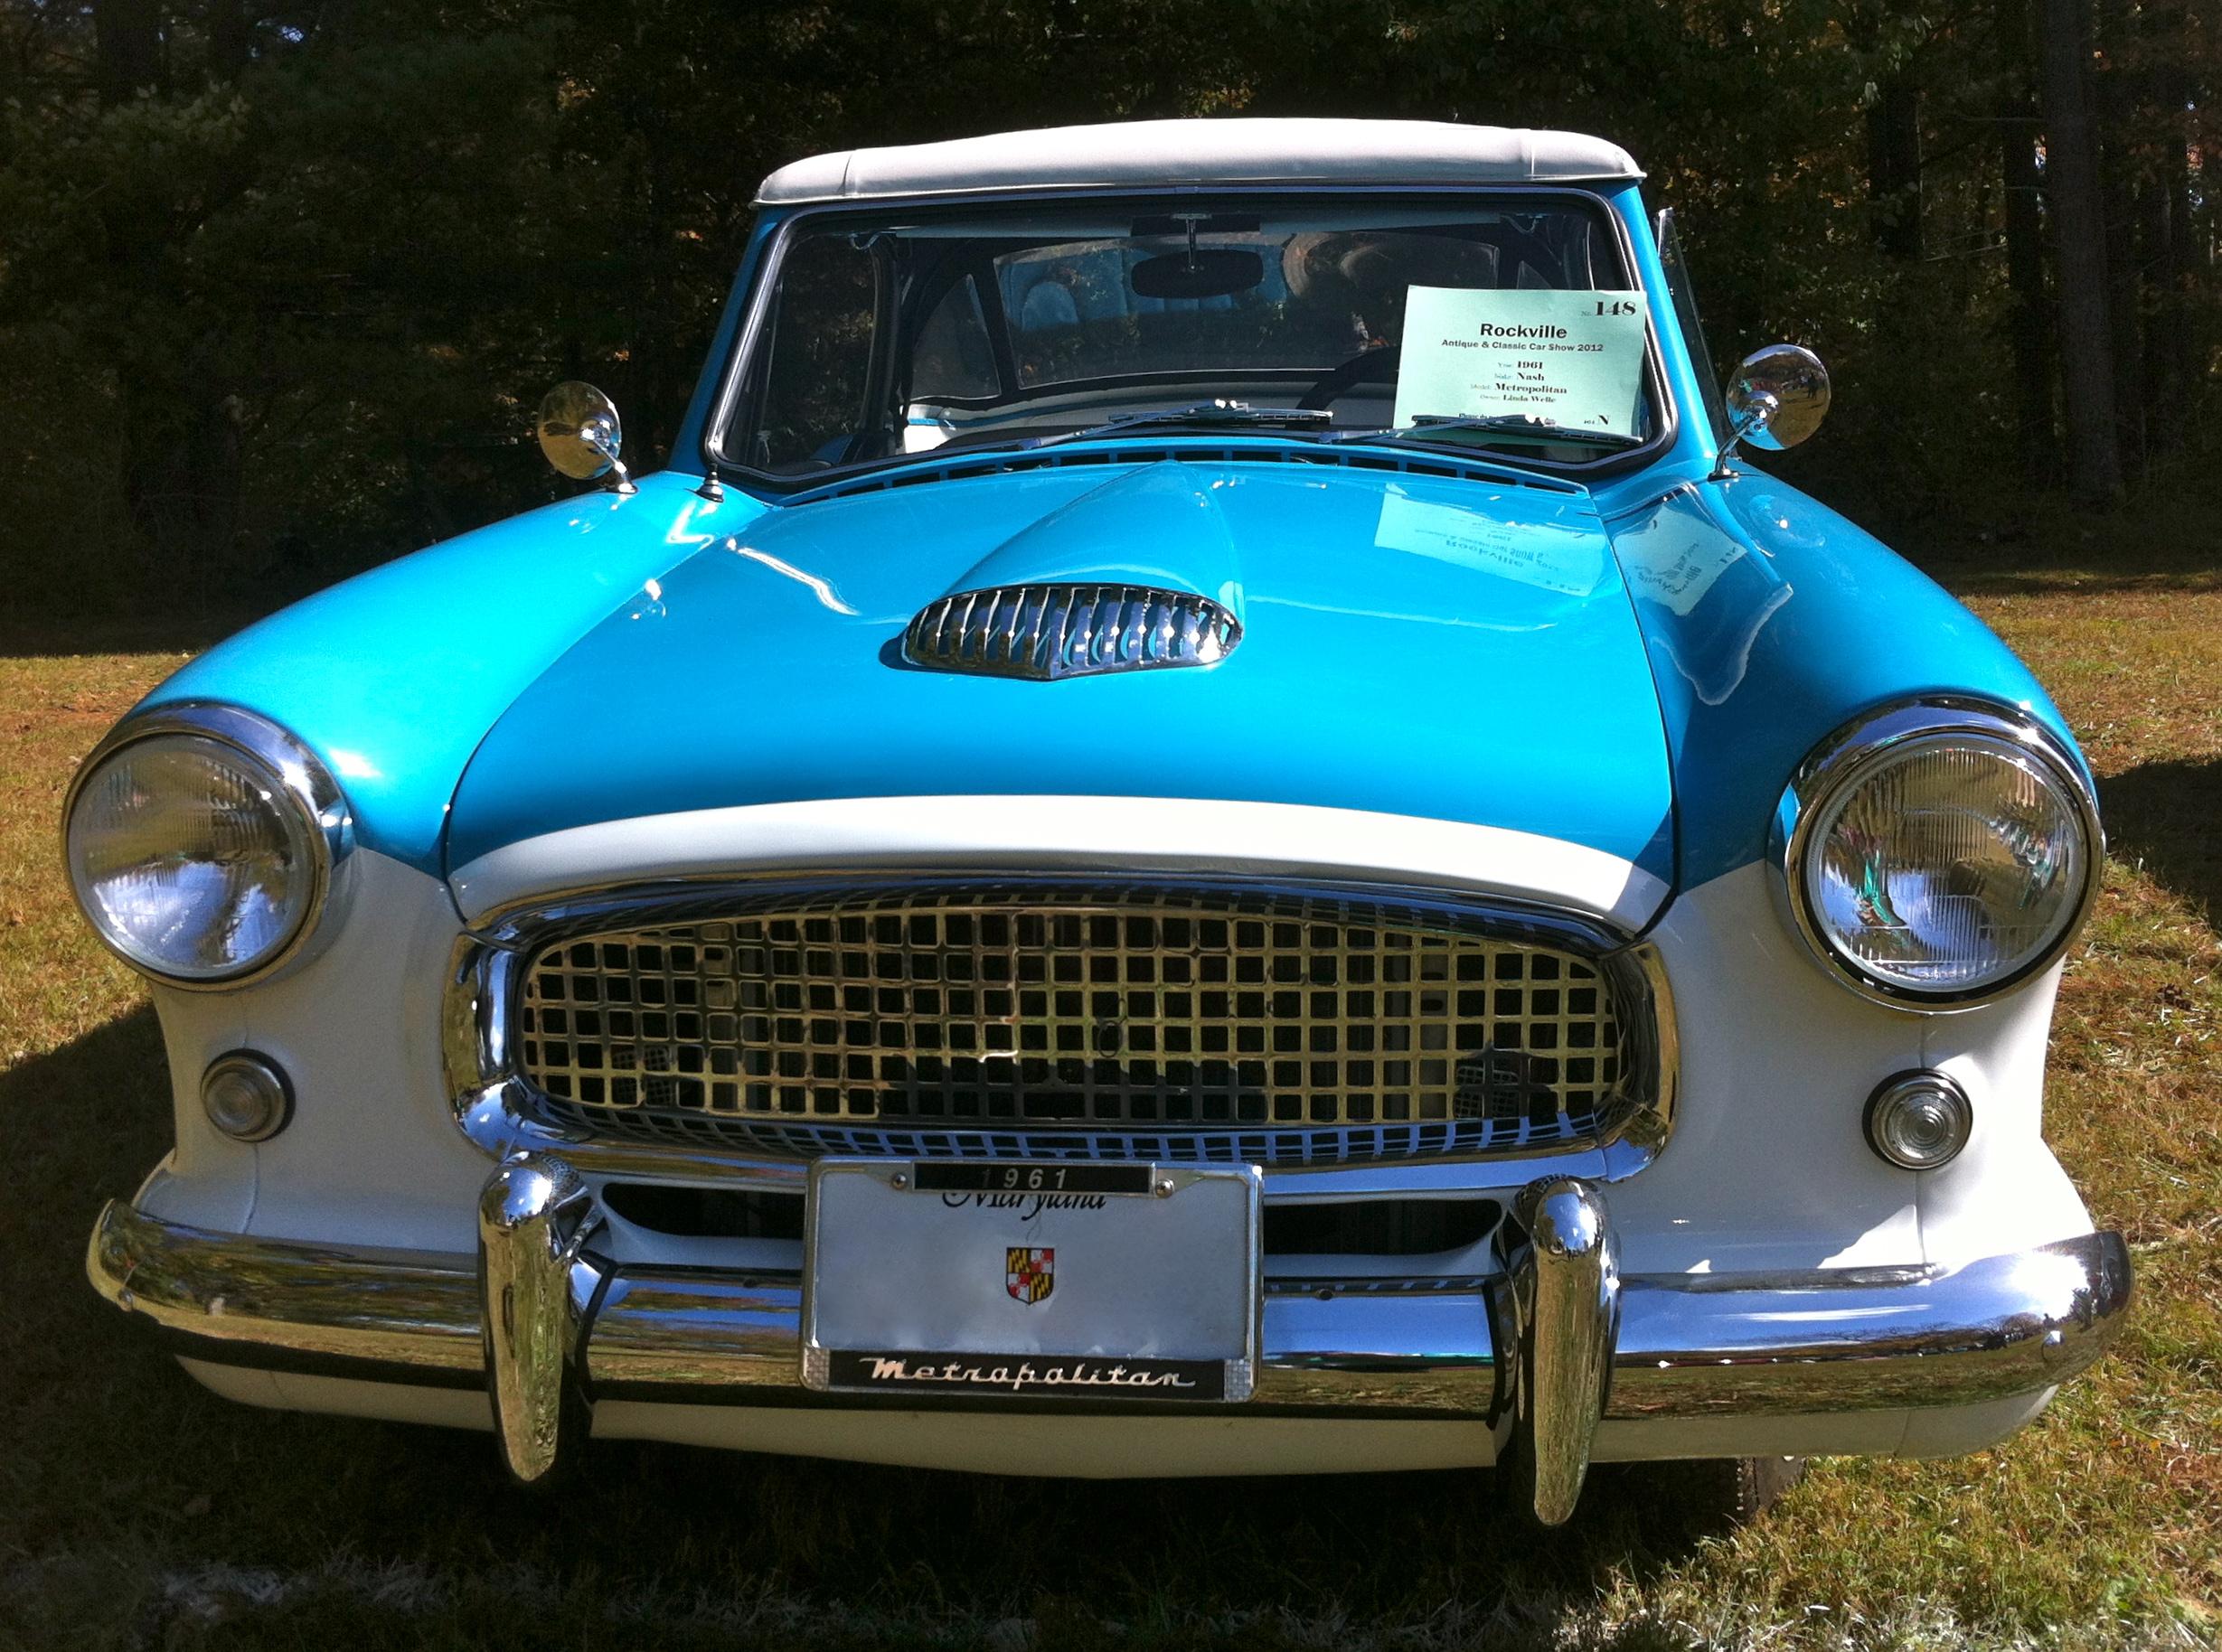 File 1961 Metropolitan convertible at 2012 Rockville f